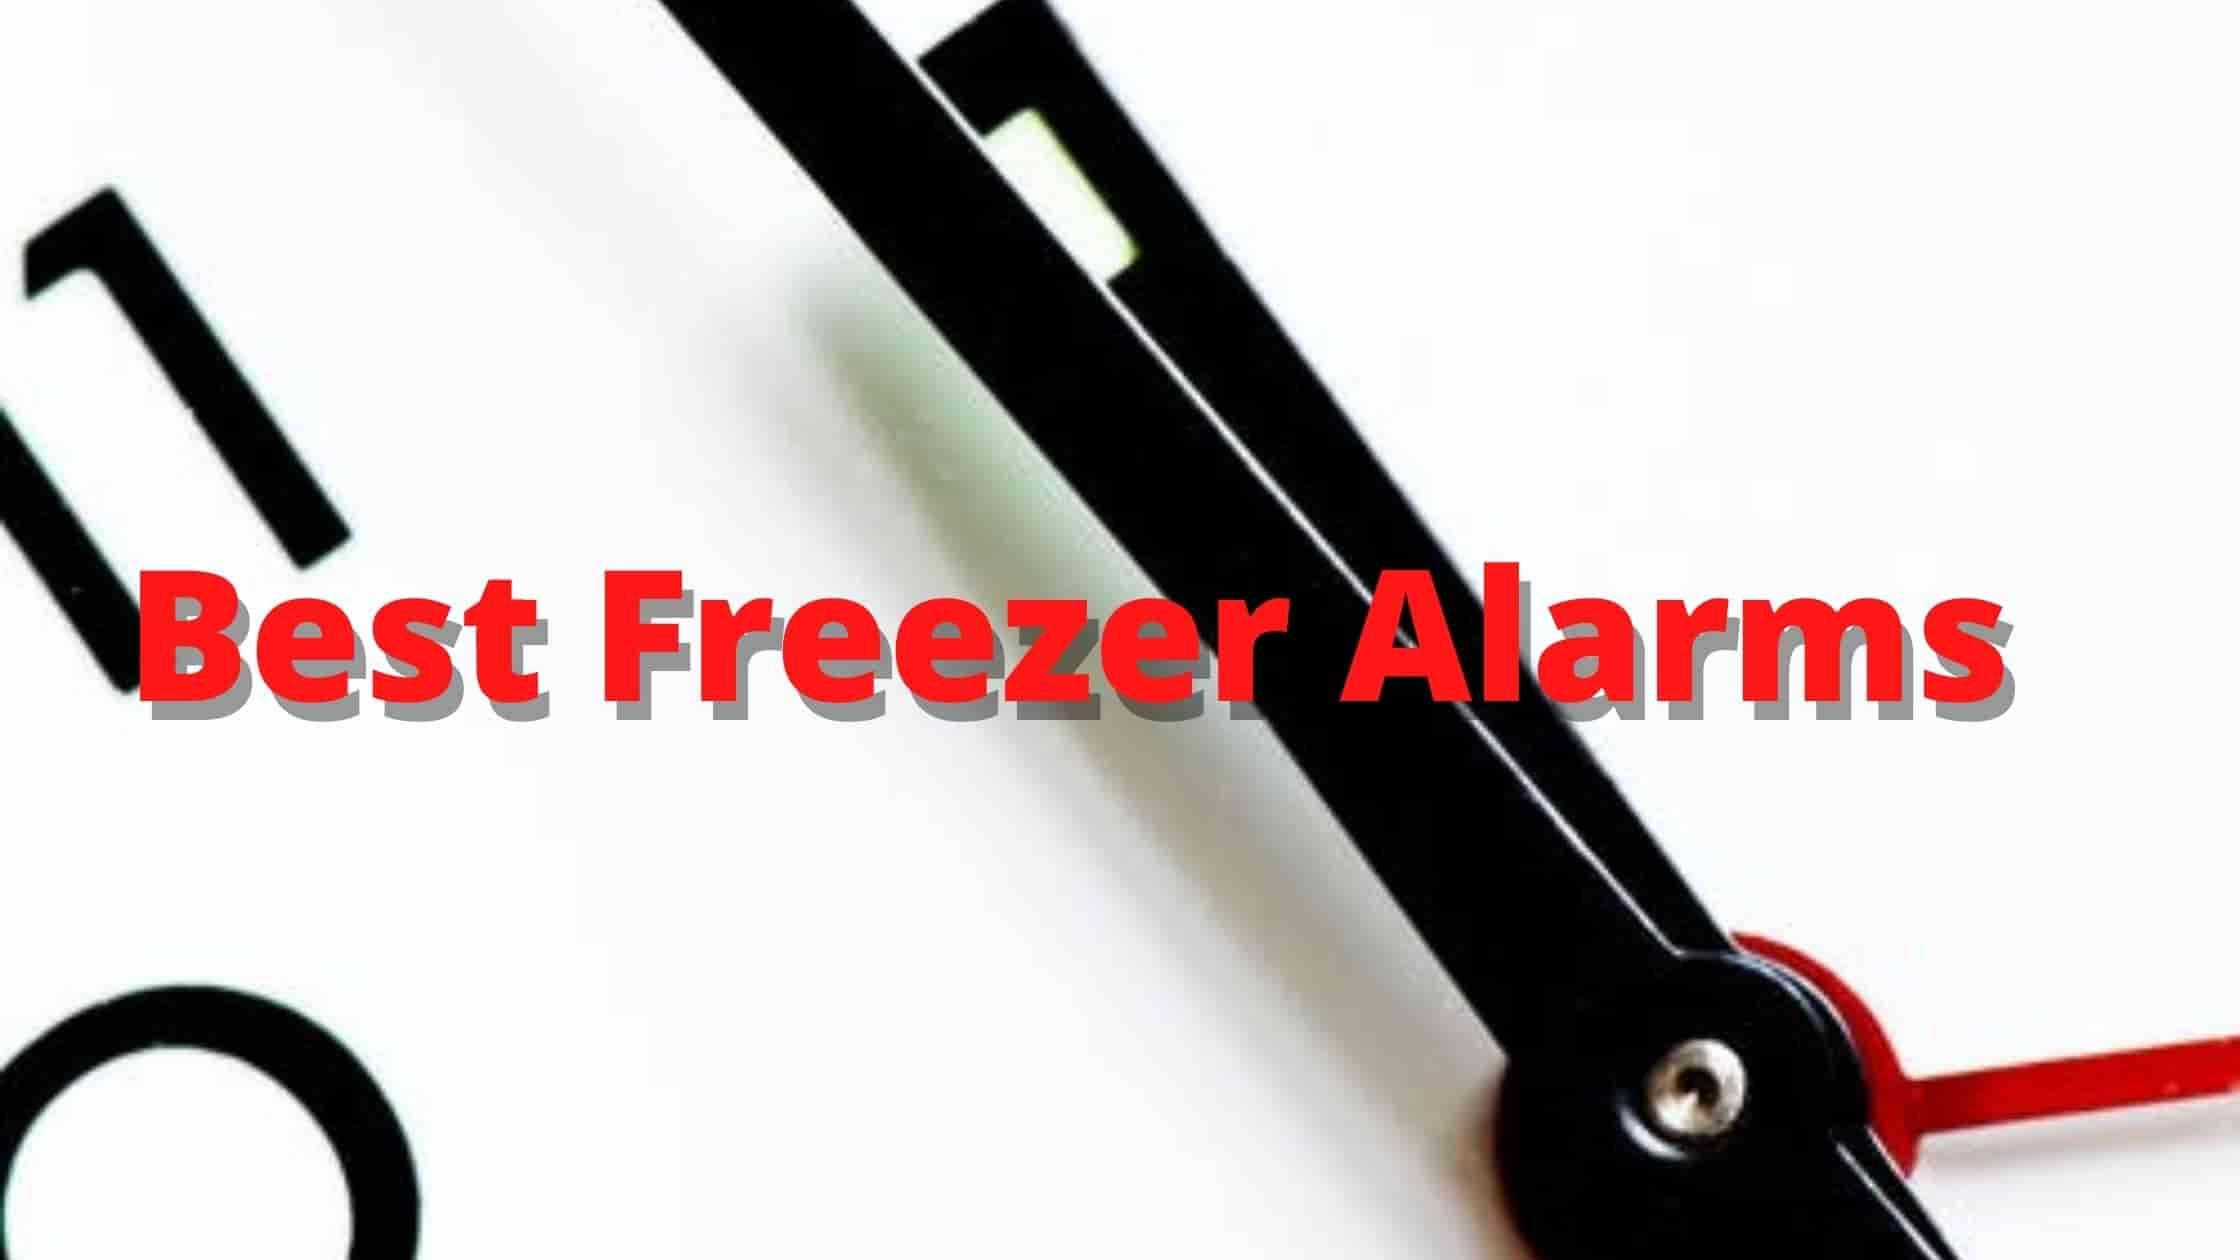 best freezer alarm for freezer monitoring